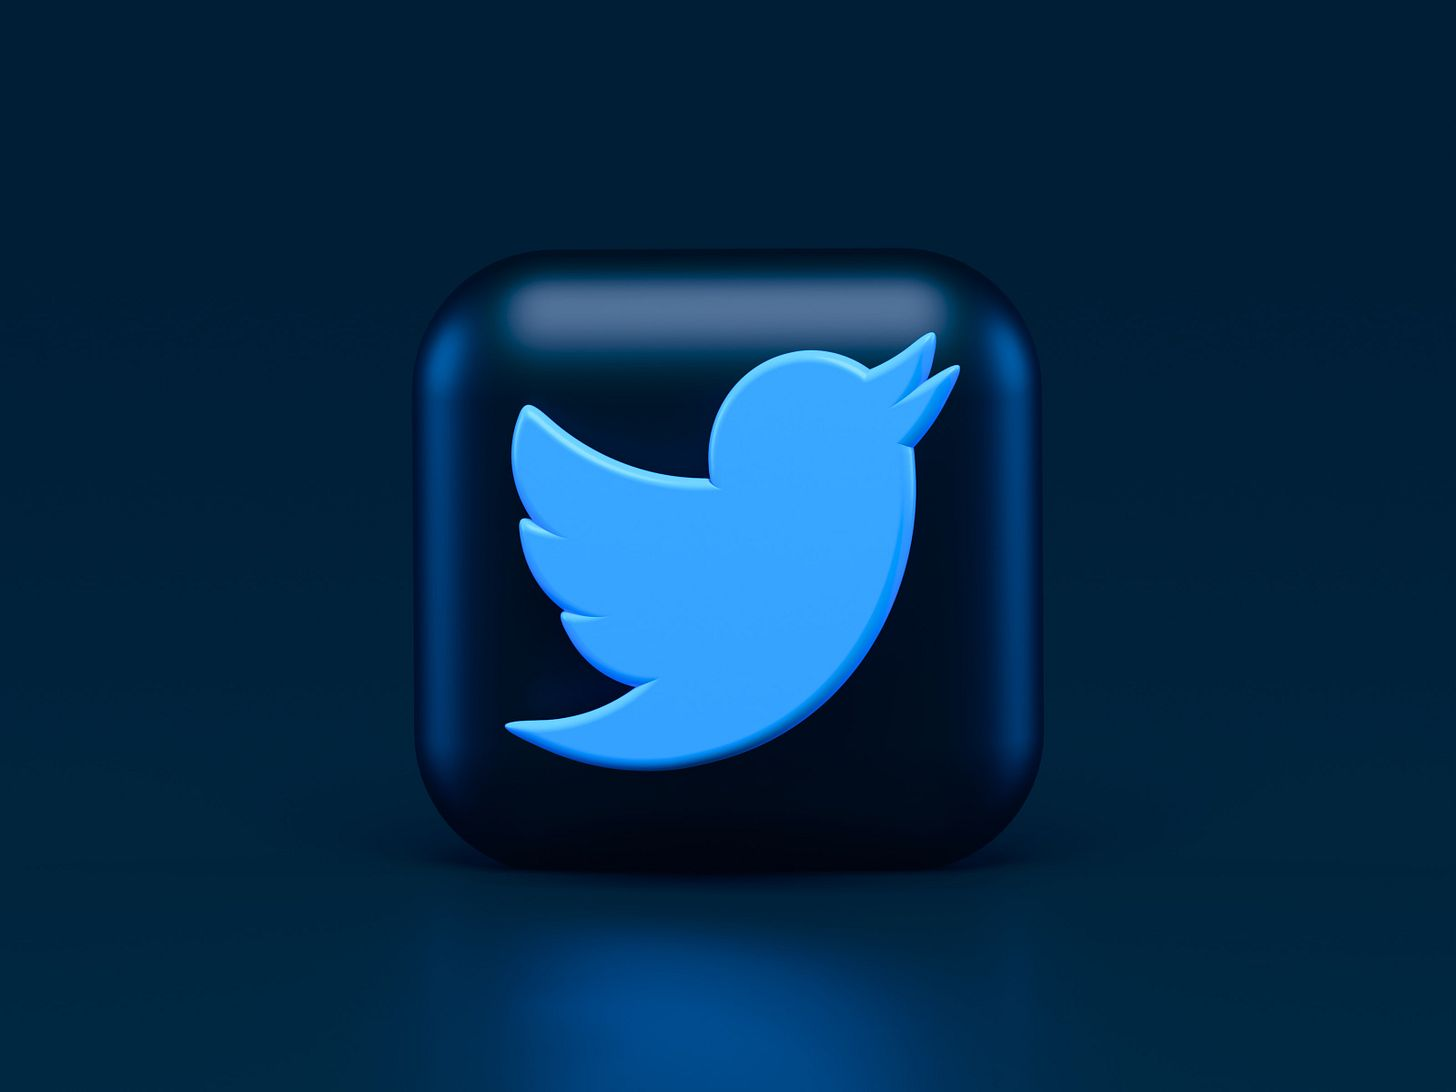 Photo illustration of the Twitter app icon. Alexander Shatov / Unsplash